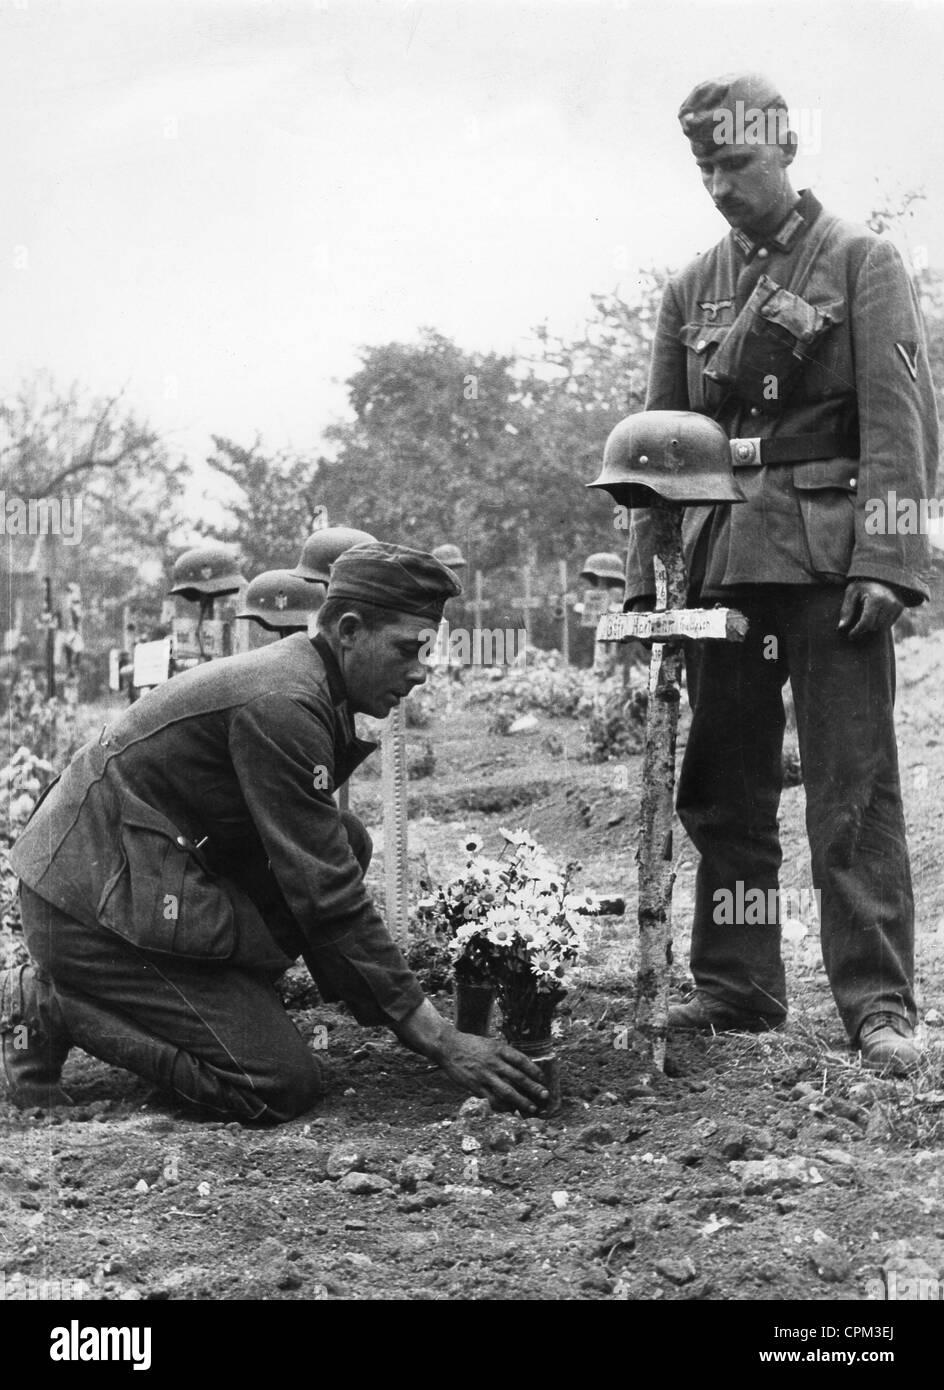 German soldiers bury a comrade, 1940 - Stock Image